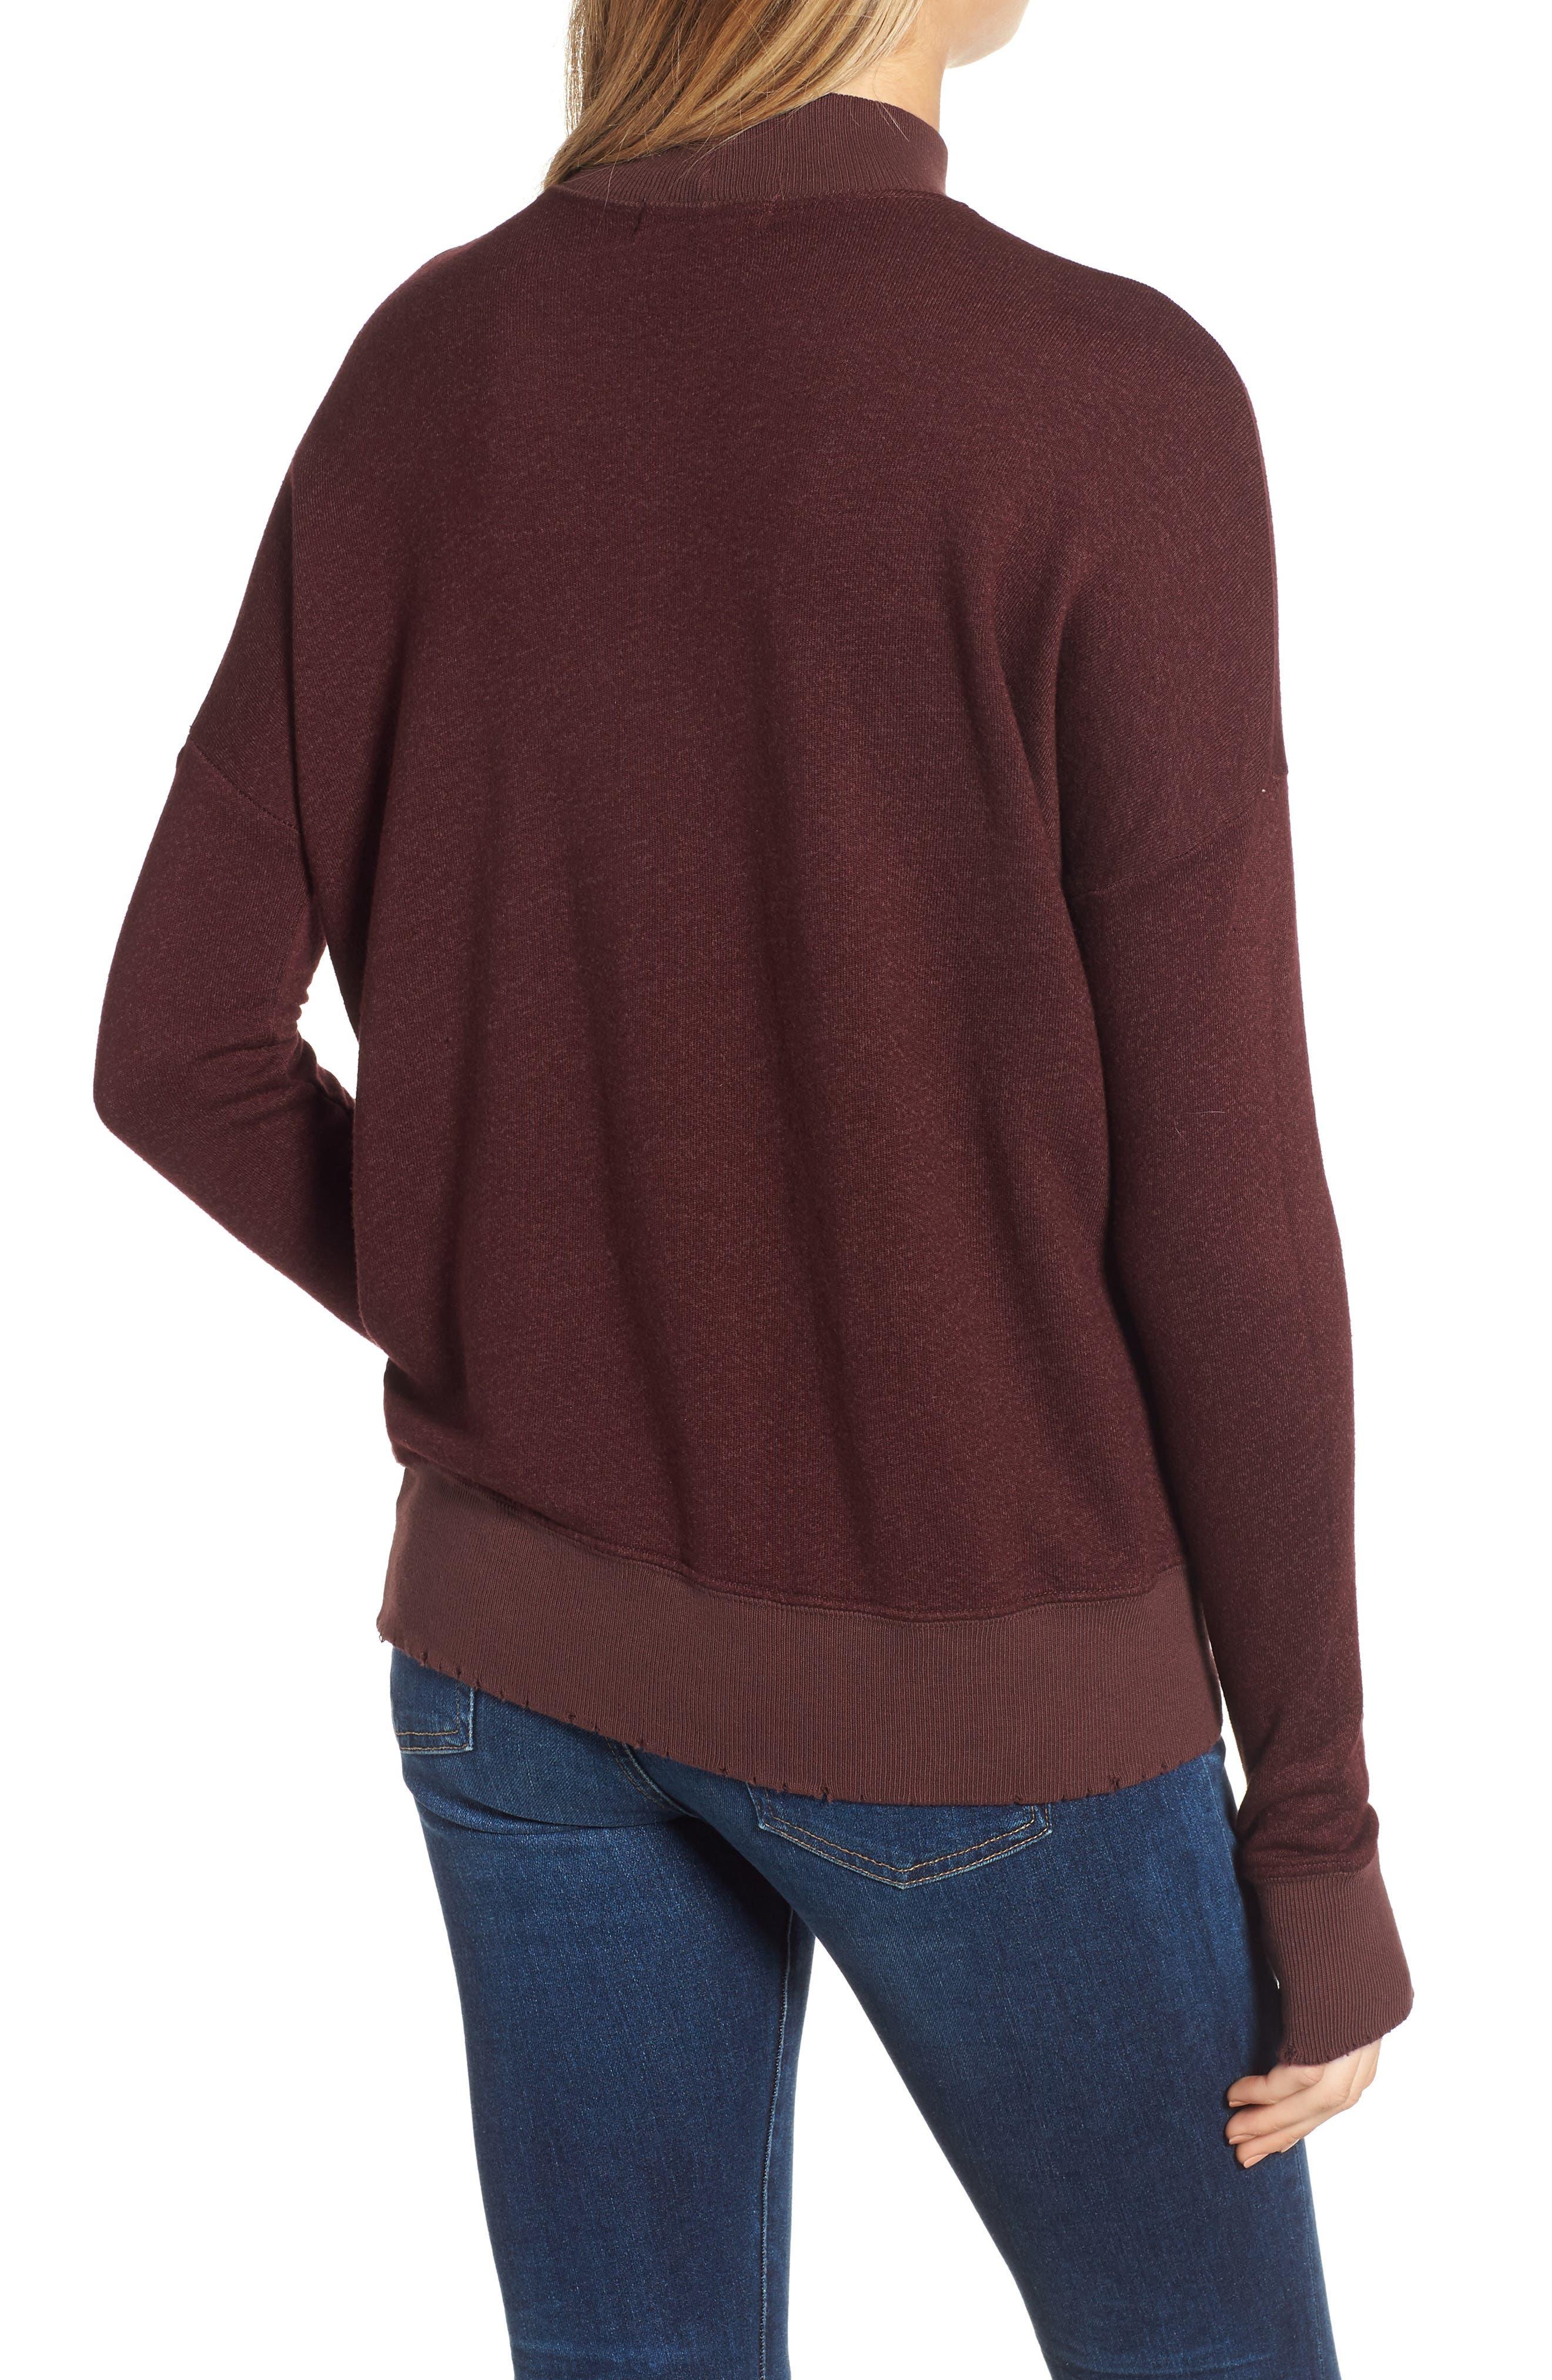 Sedro Arm Cutout Sweatshirt,                             Alternate thumbnail 2, color,                             WINETASTING